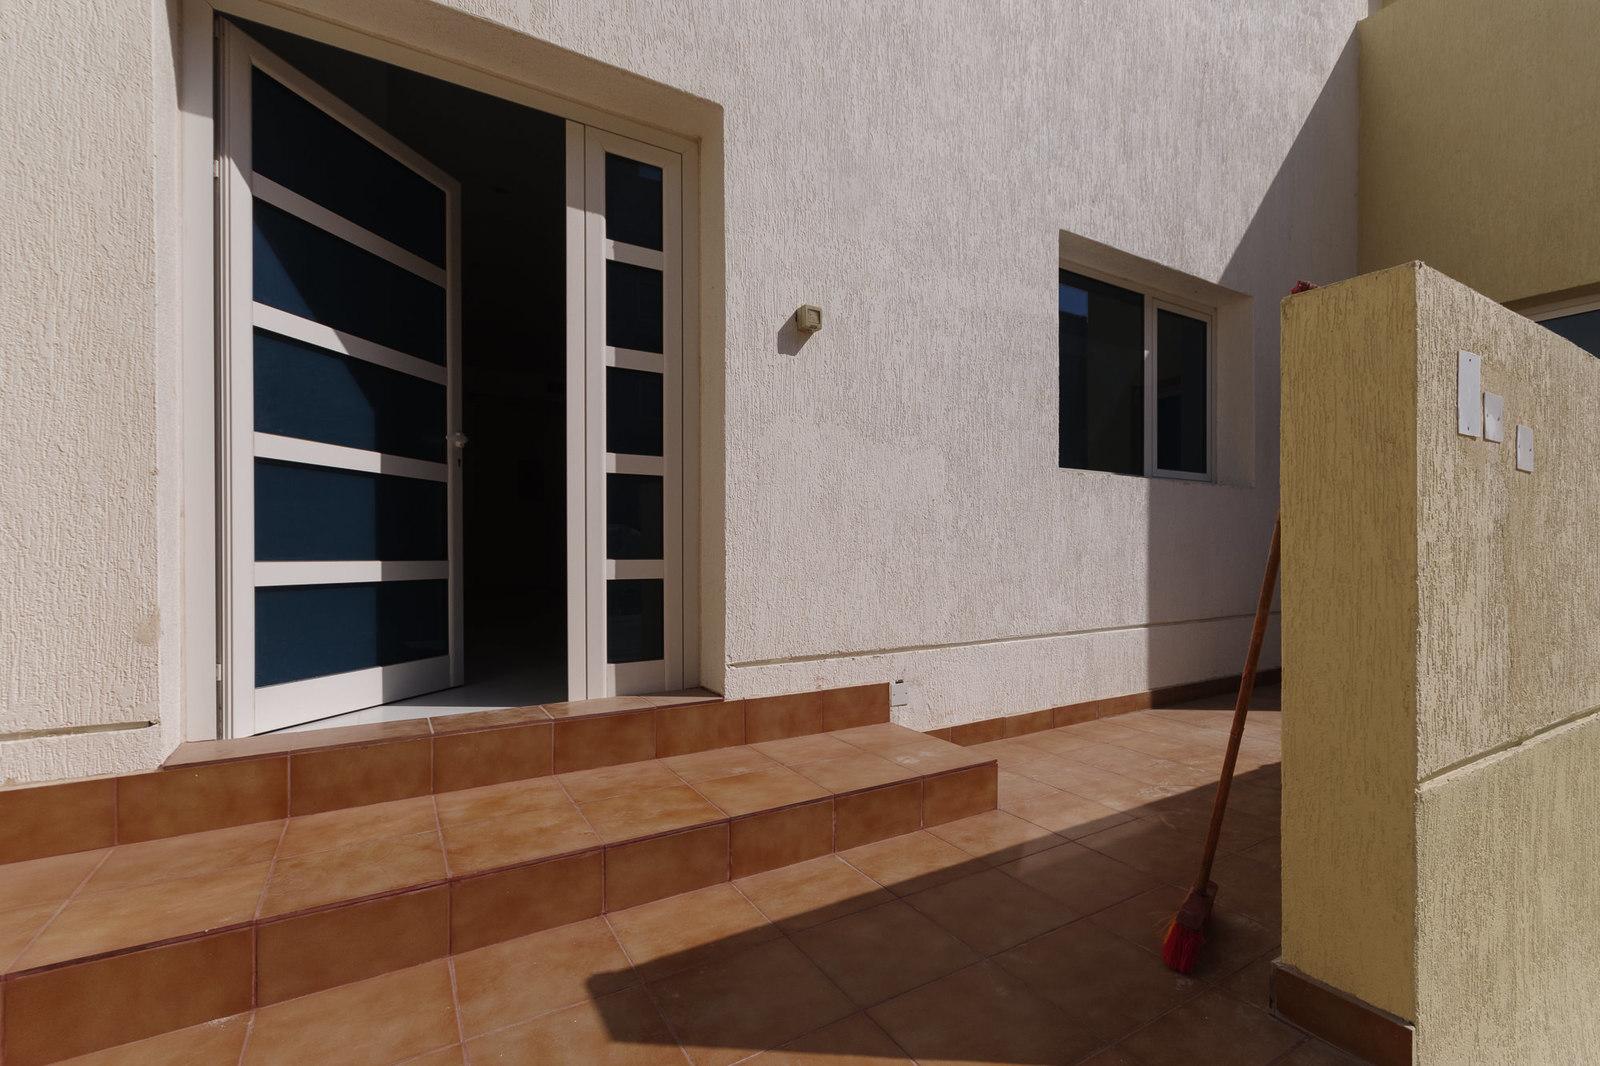 Jaber Al Ahmad – great, brand new, three bedroom apartments